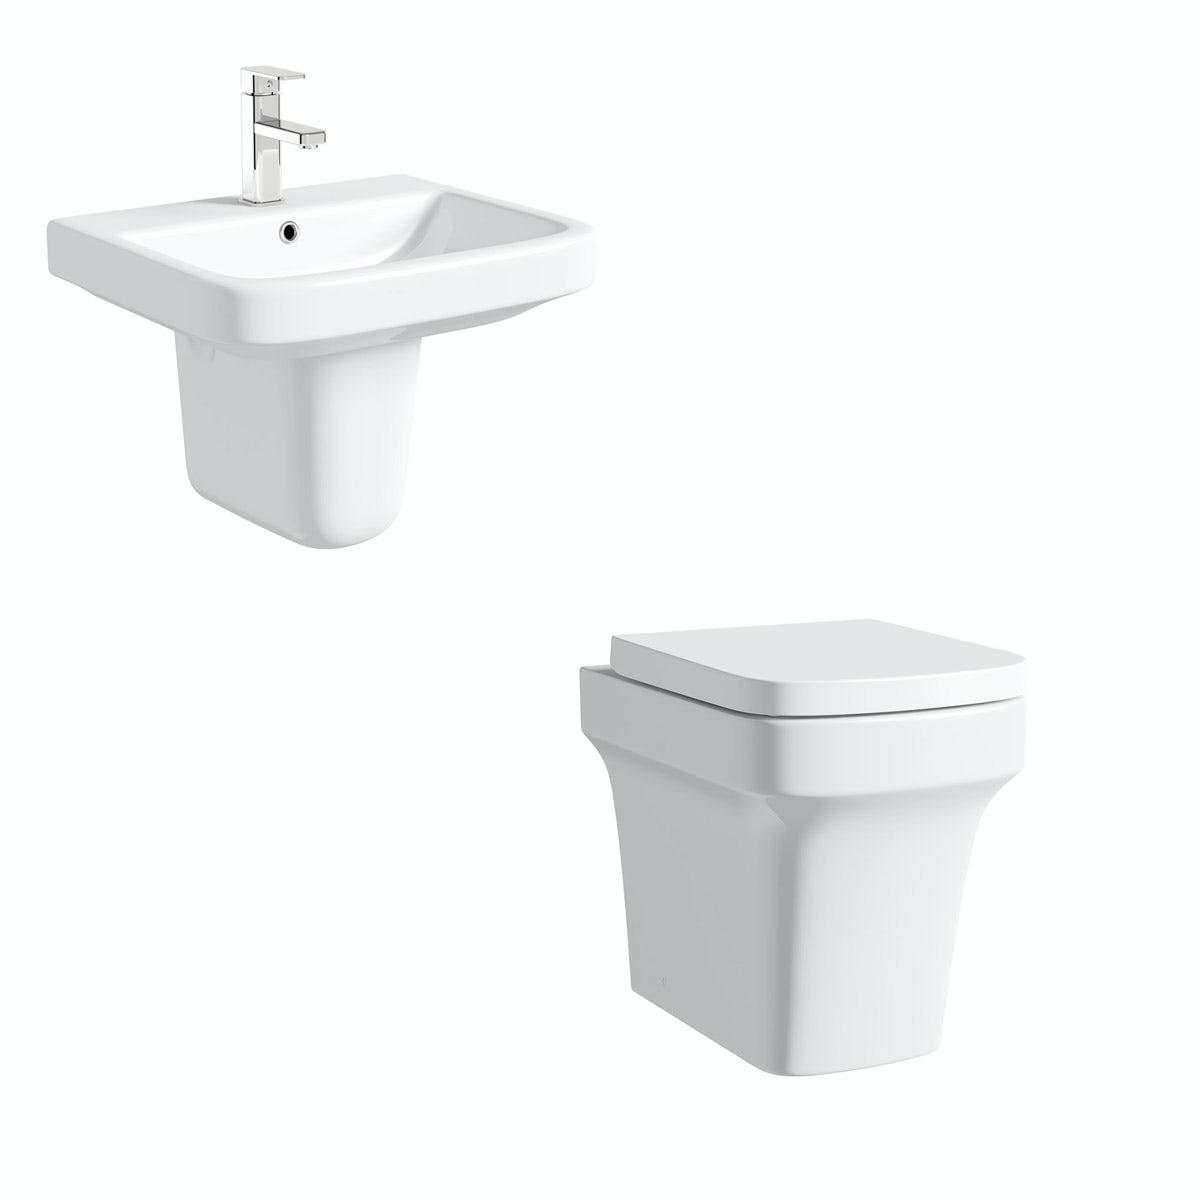 Mode Carter cloakroom suite with semi pedestal basin 555mm